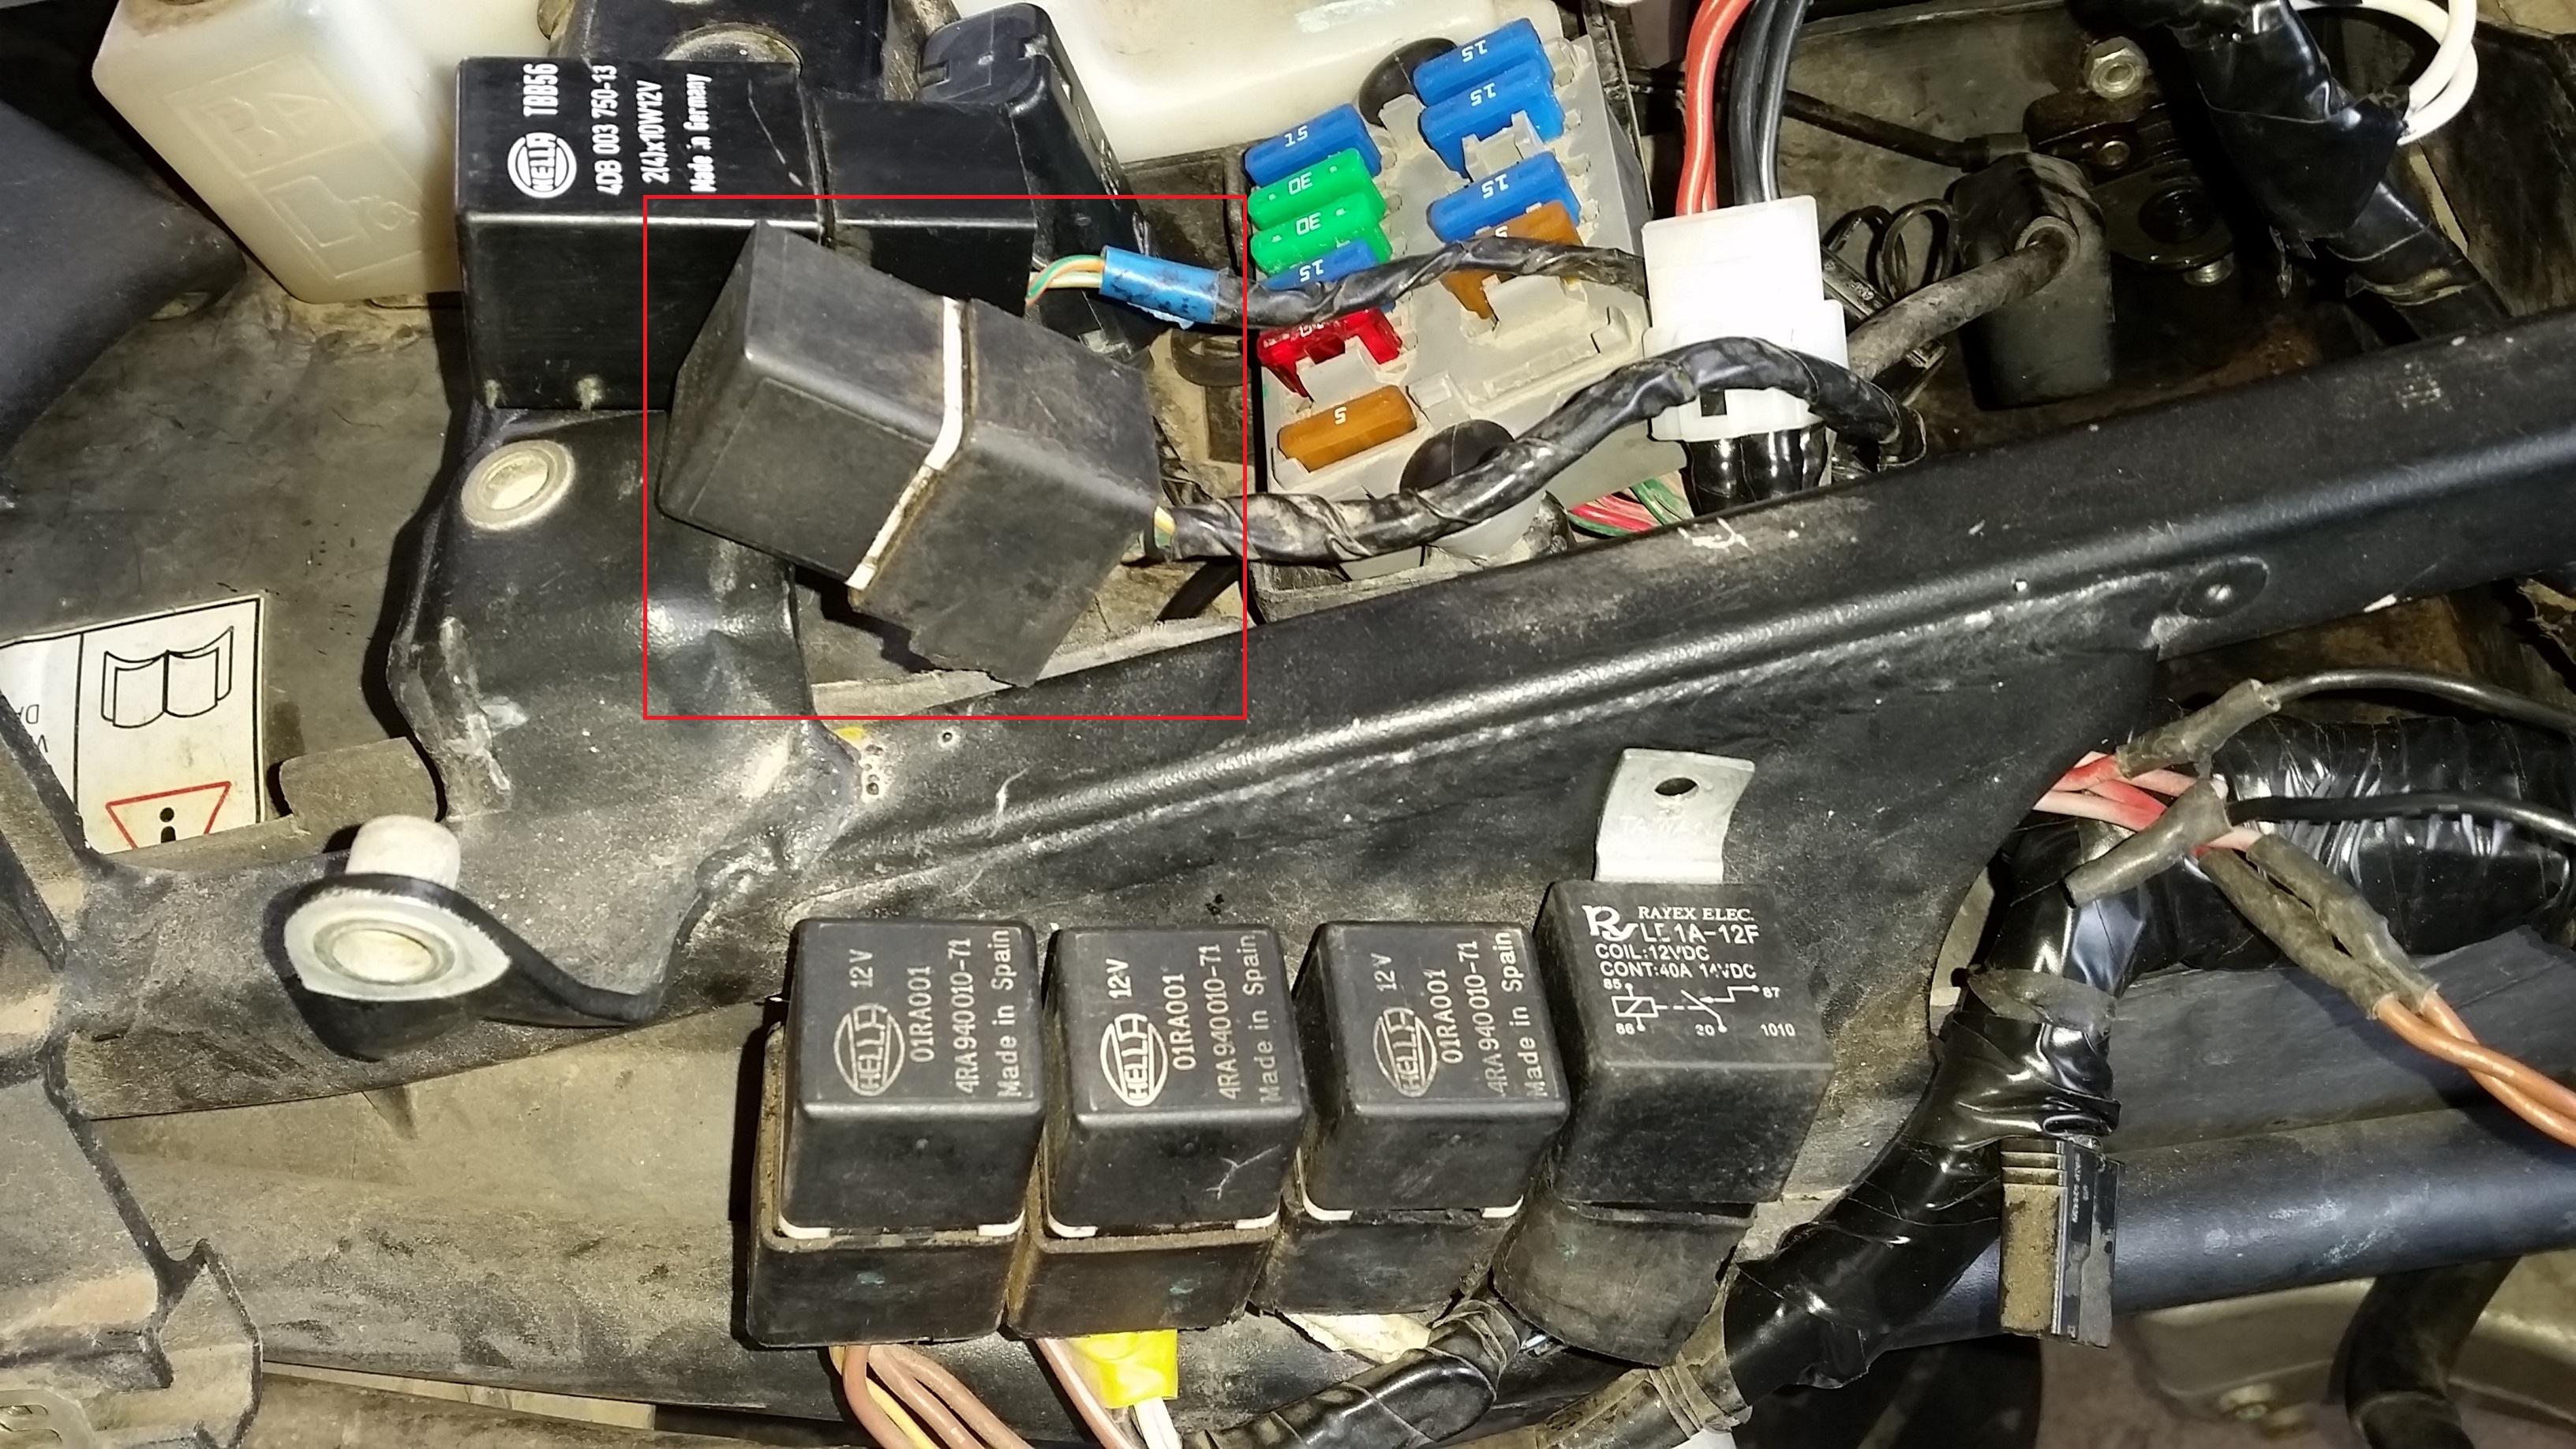 I Have A  U0026 39 02 955i Daytona This Bike Cranks But Doesn U0026 39 T Start I Found A Trouble Code P0230 Fuel